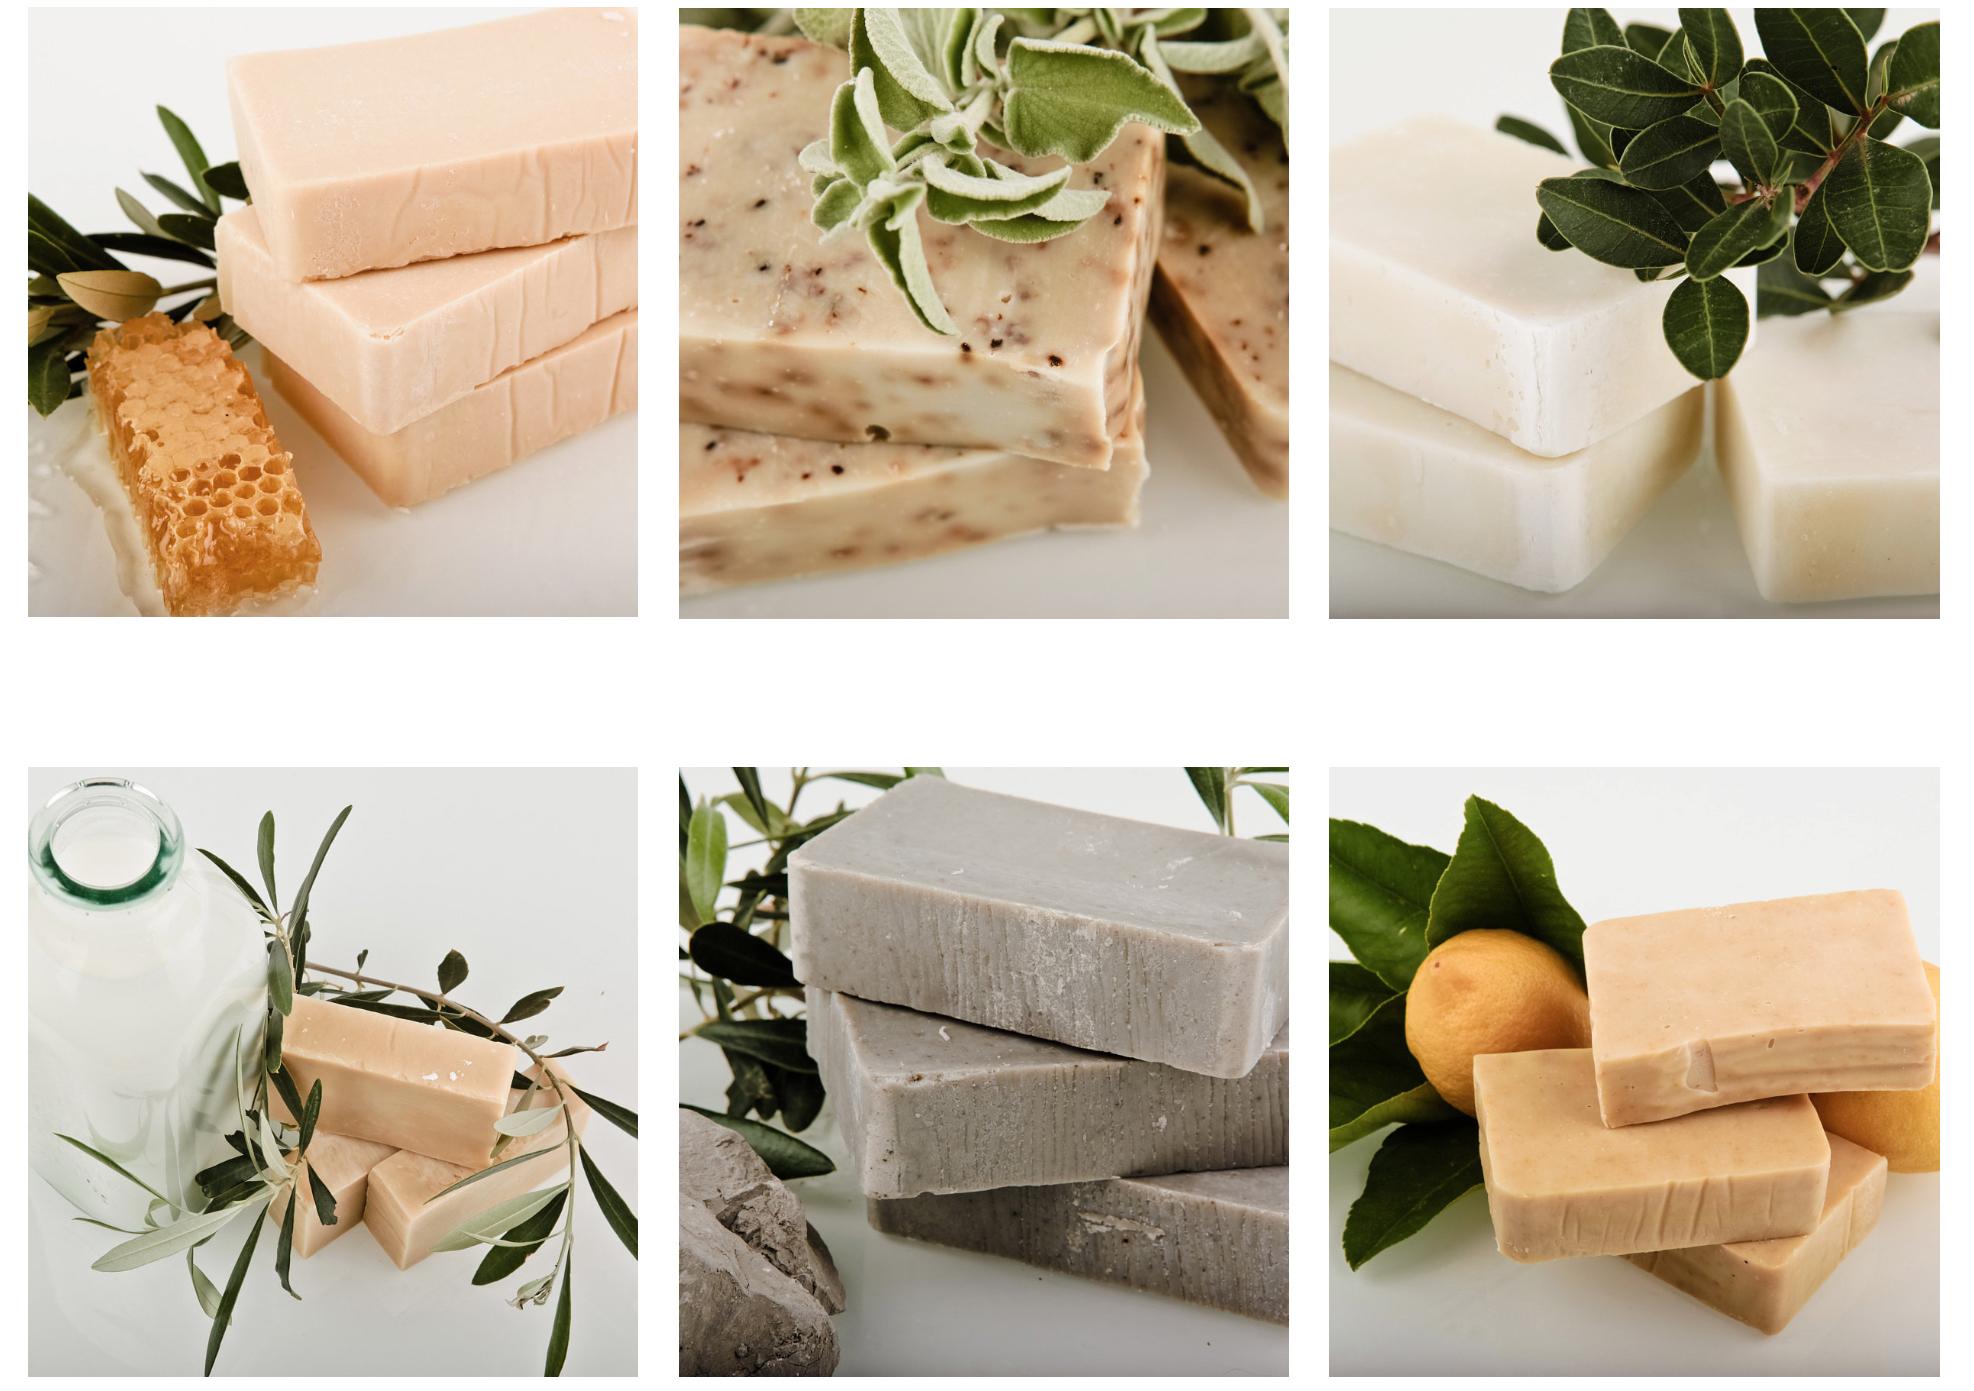 laouta-soaps